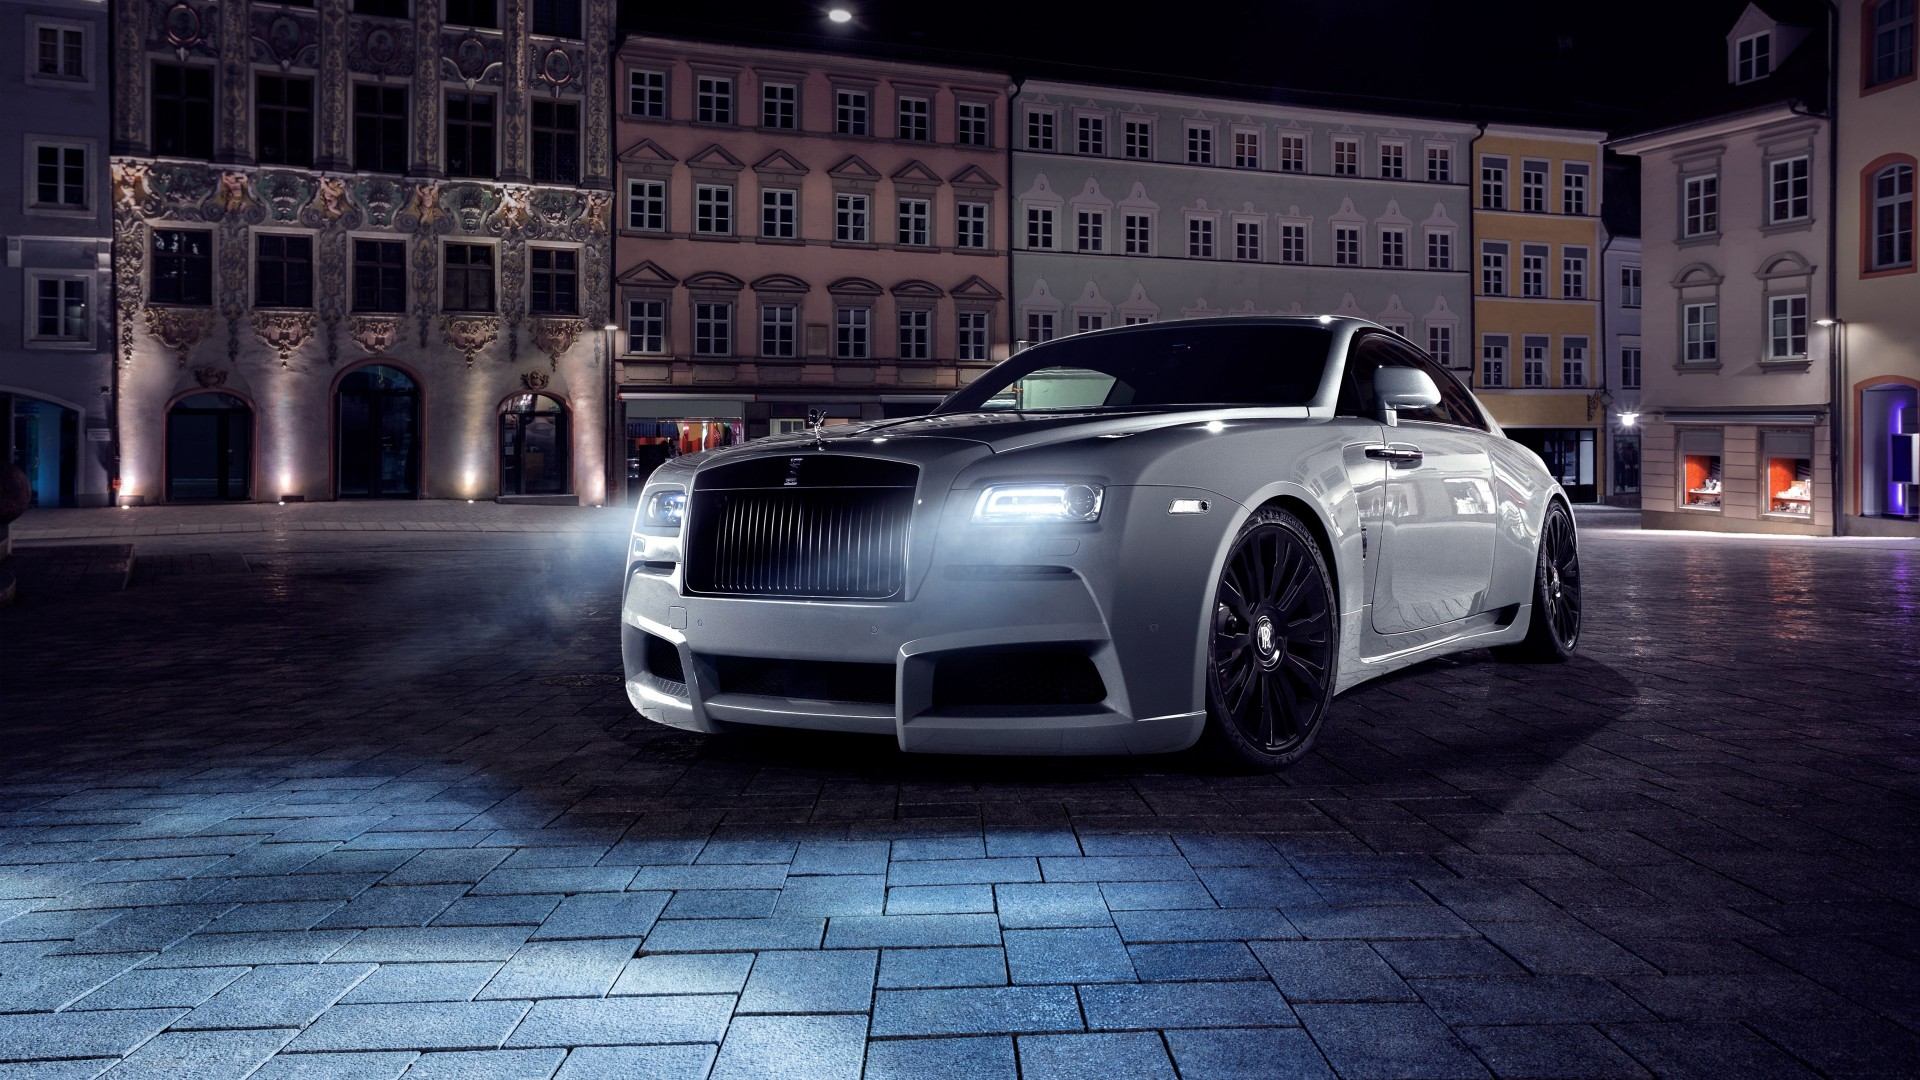 Spofec rolls royce wraith wallpaper hd car wallpapers - Royal royce car wallpaper ...